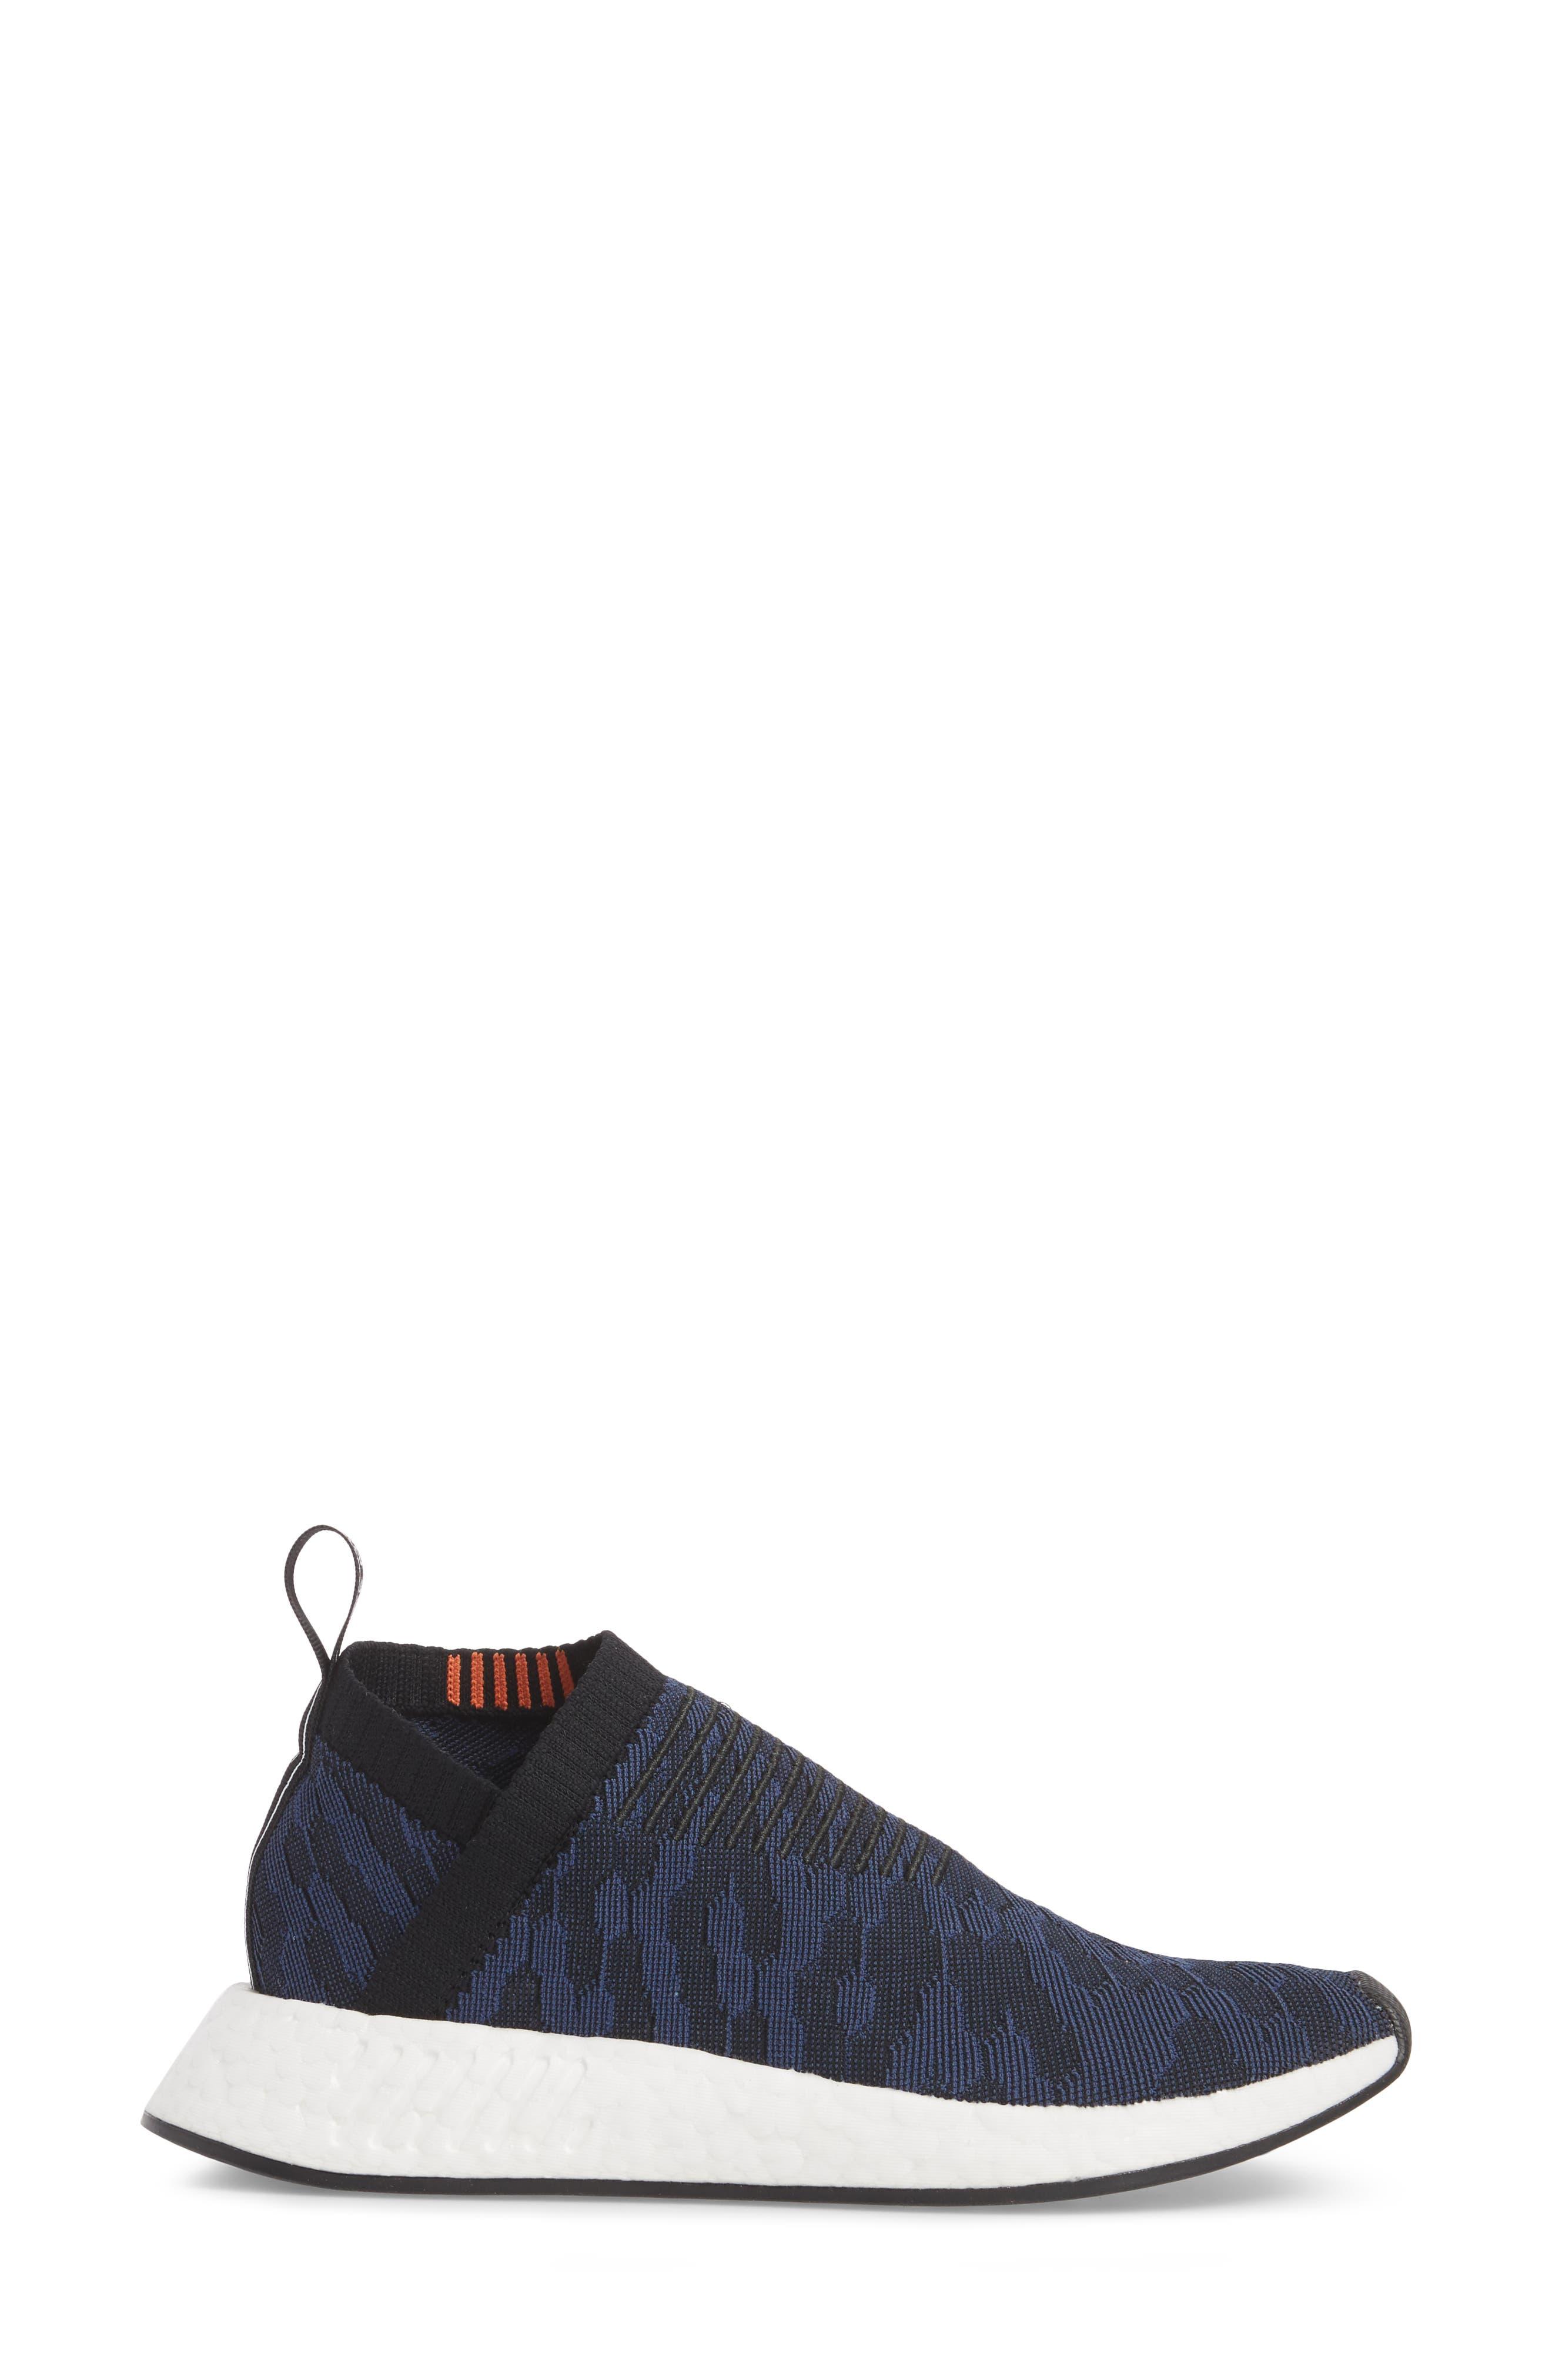 NMD CS2 Primeknit Sneaker,                             Alternate thumbnail 3, color,                             Core Black/ Noble Indigo